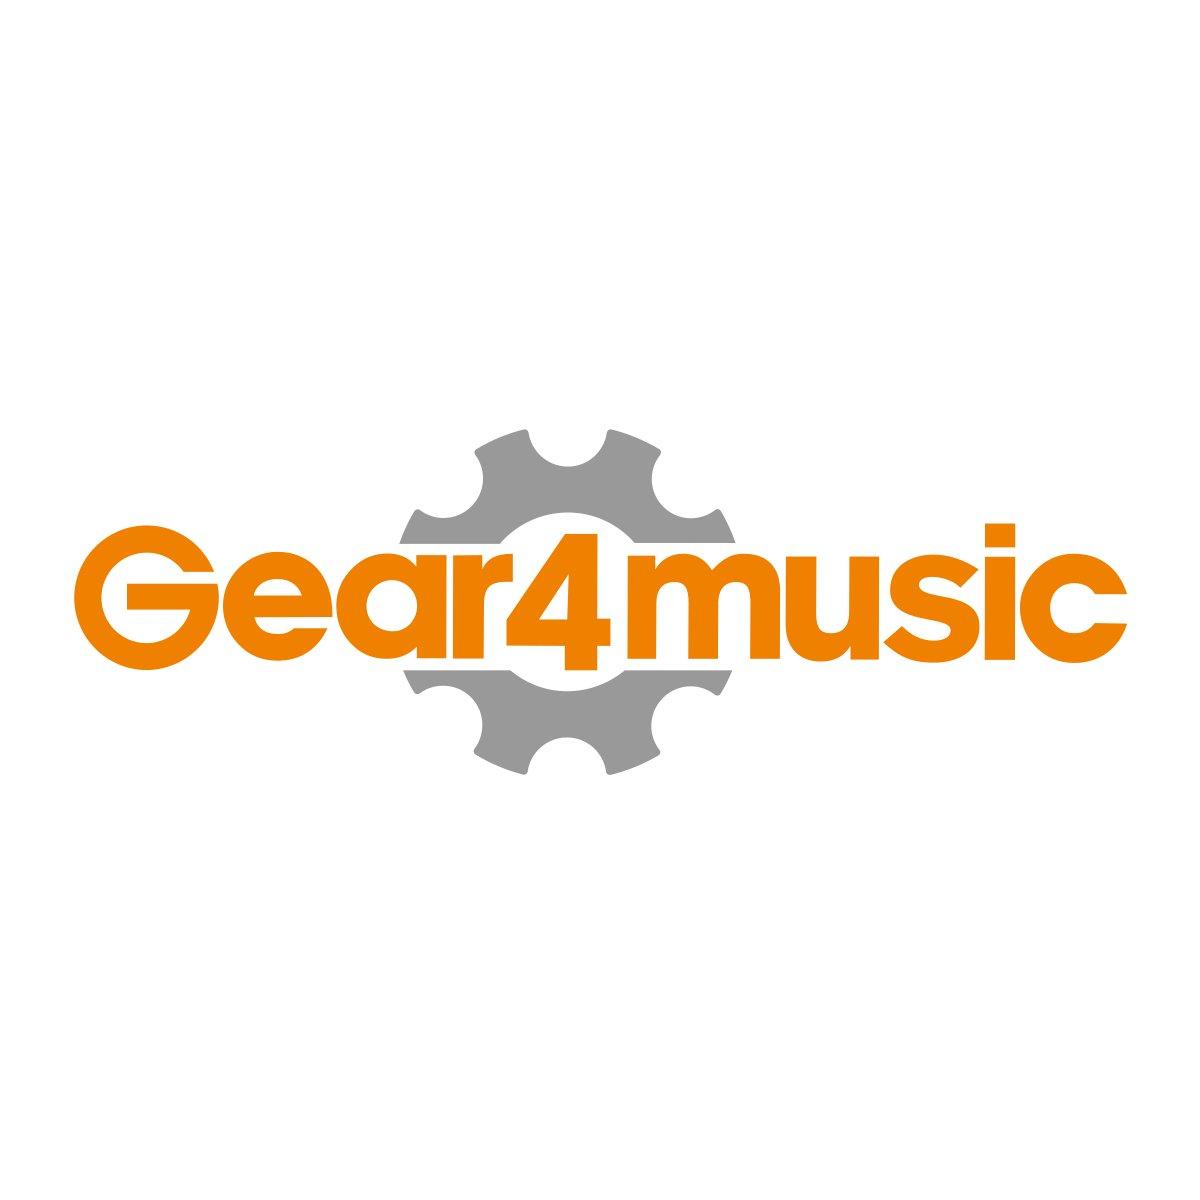 MK-7000 Keyboard with USB by Gear4music - B-Stock